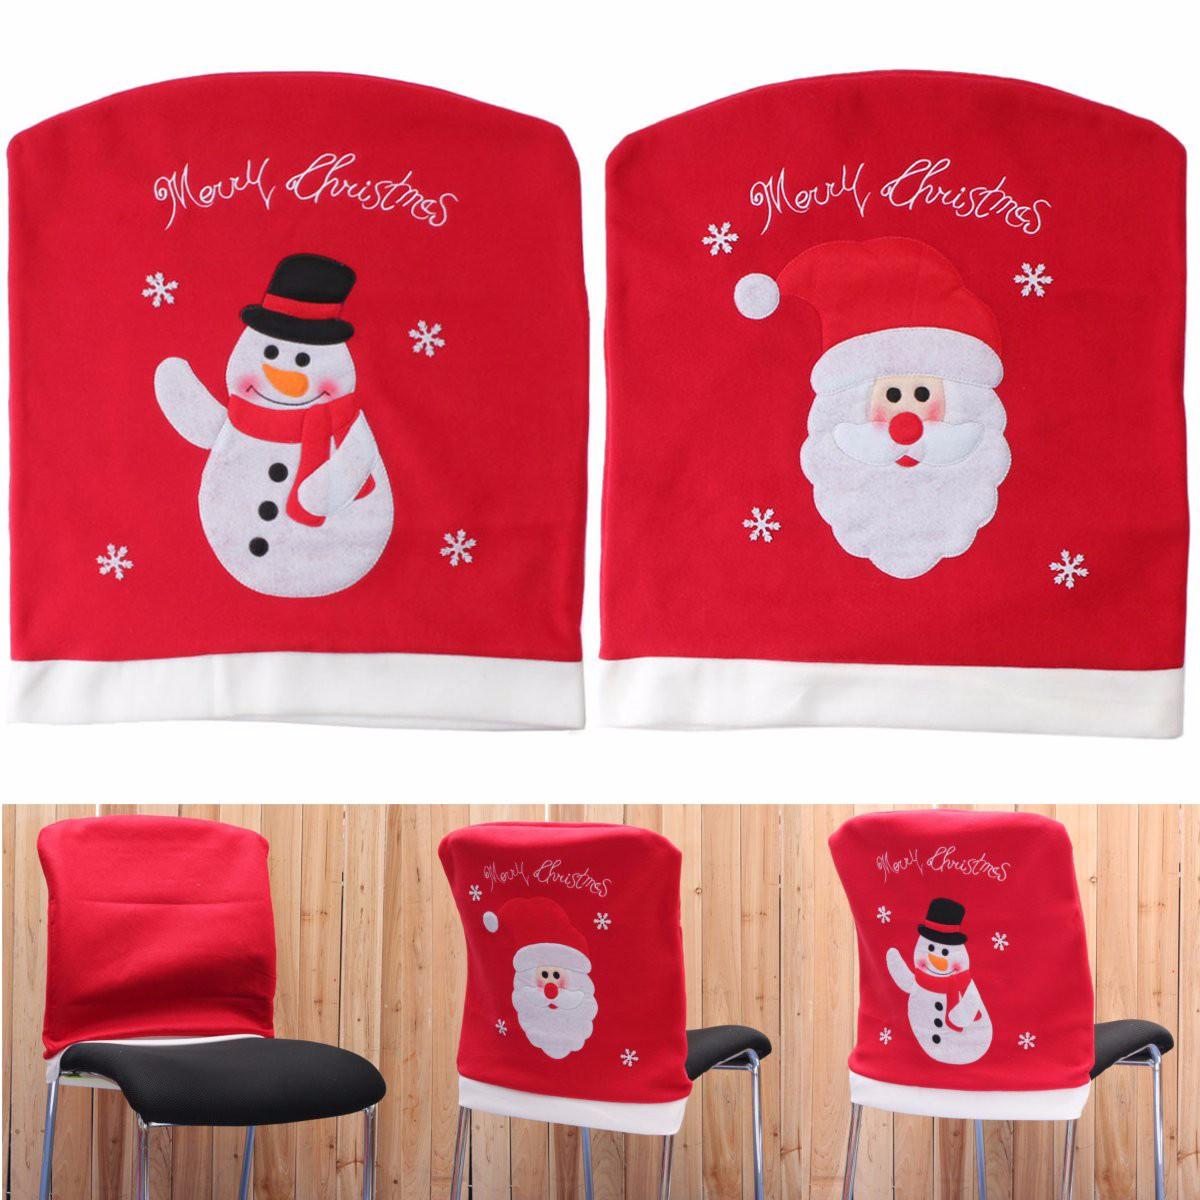 Christmas Chair Back Cover Santa Claus Snowman Dinner